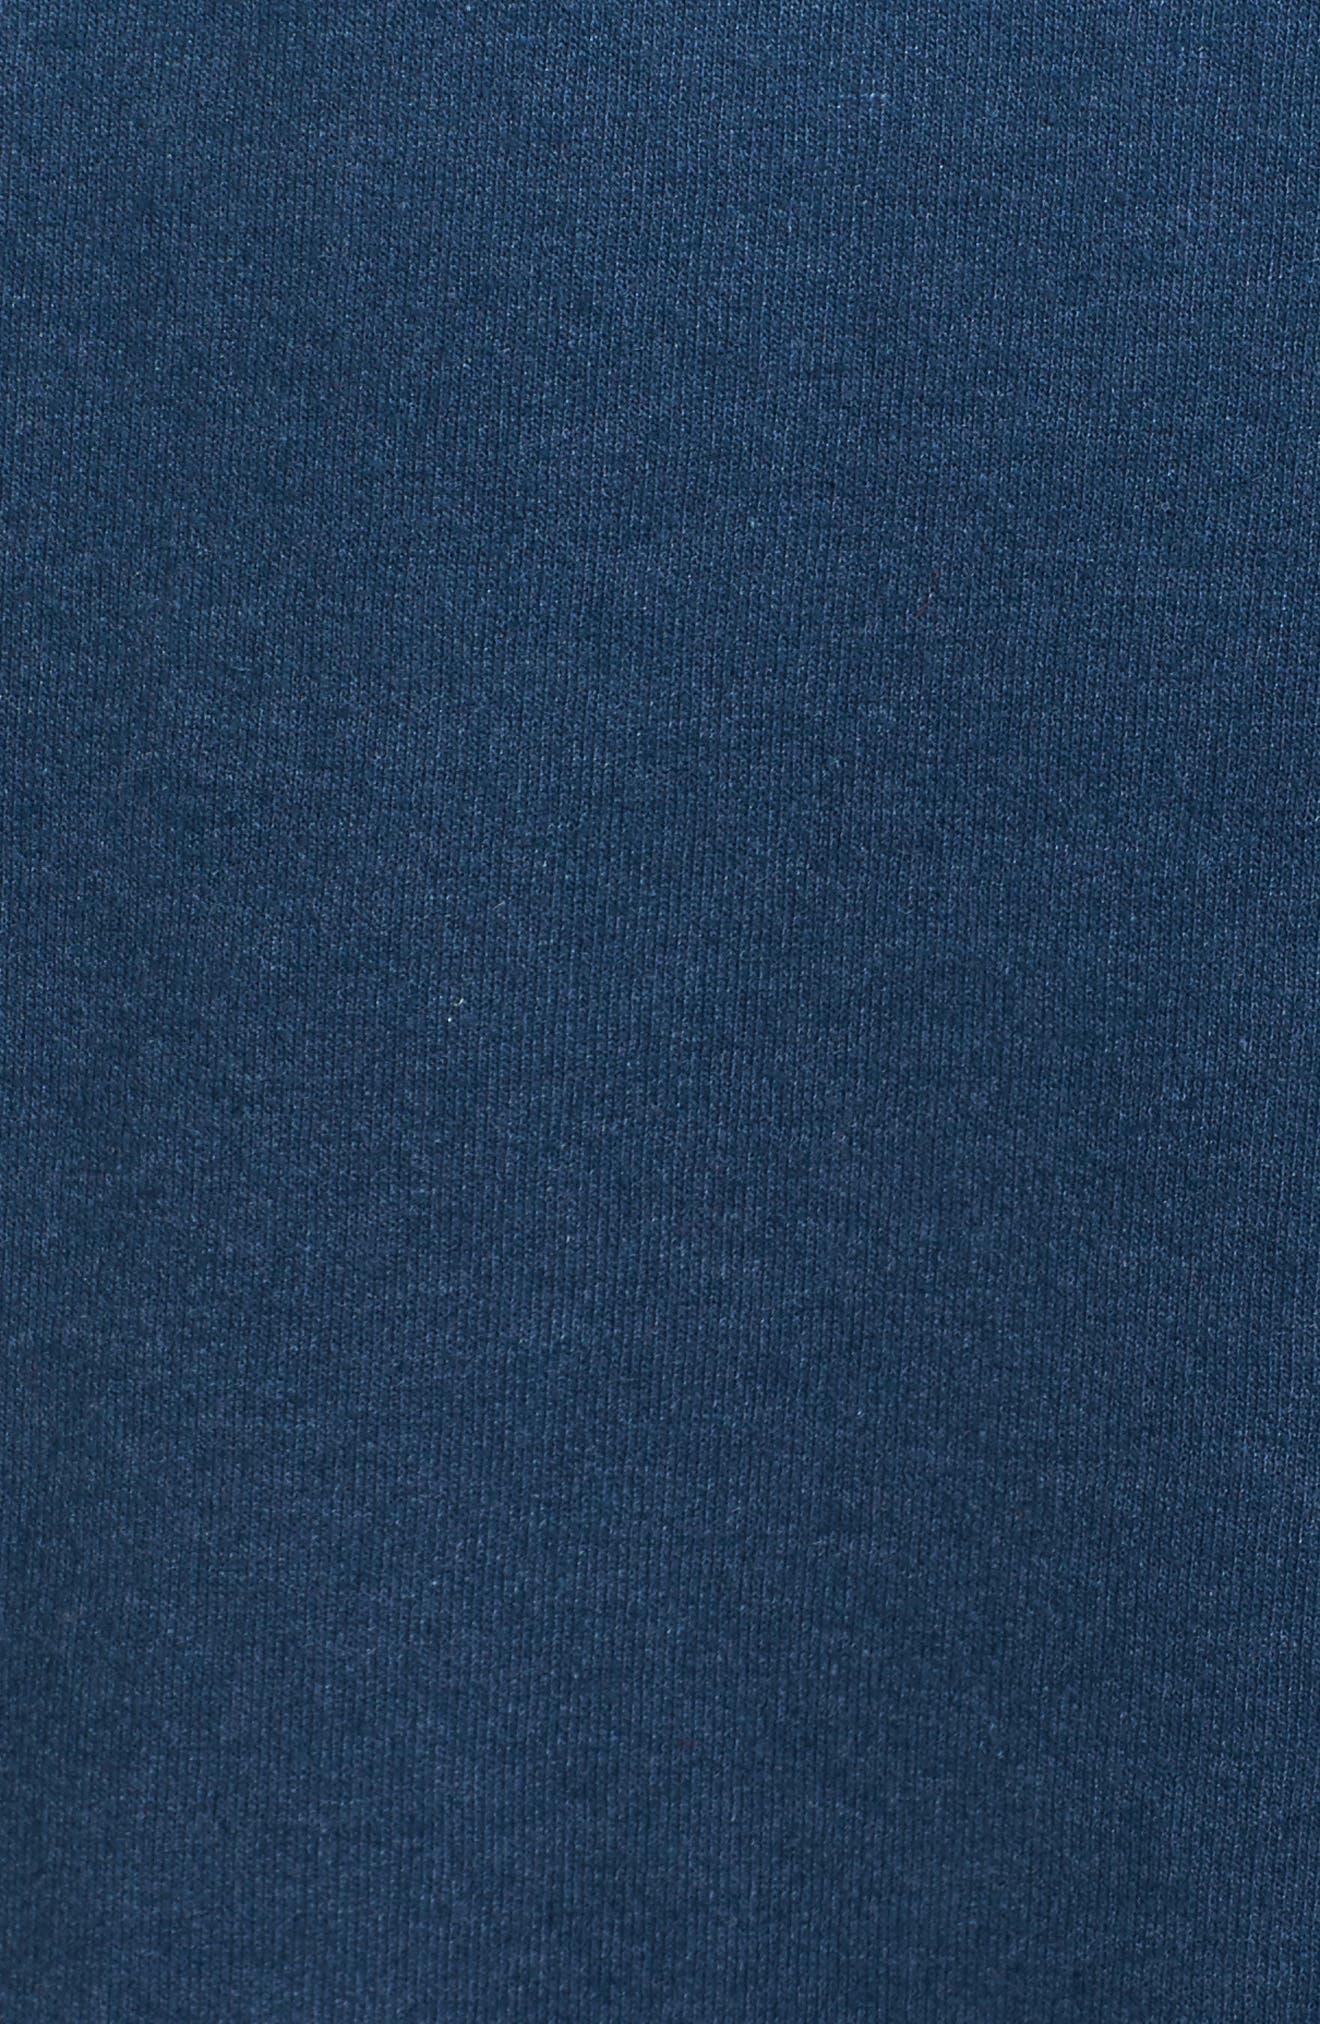 The Beatles Ombré Sweatshirt,                             Alternate thumbnail 6, color,                             True Navy